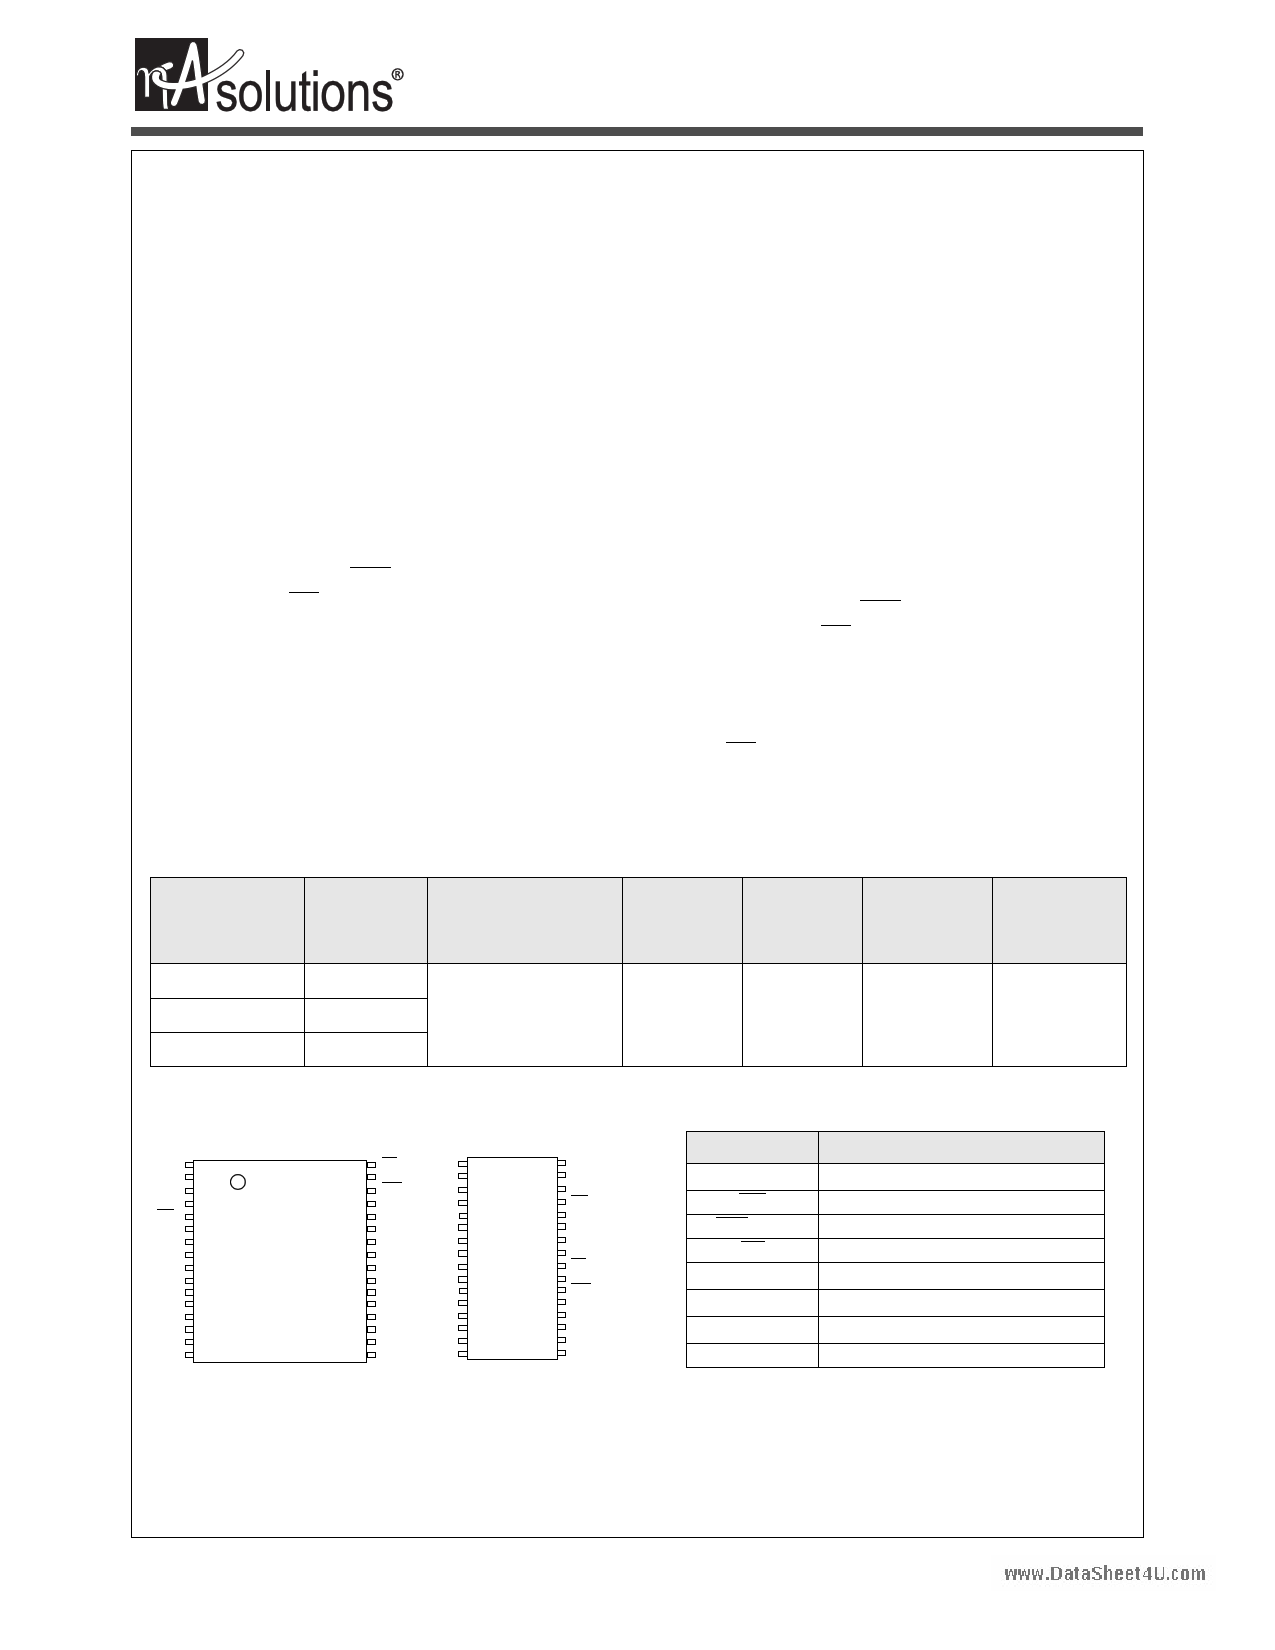 N01L083WC2A datasheet